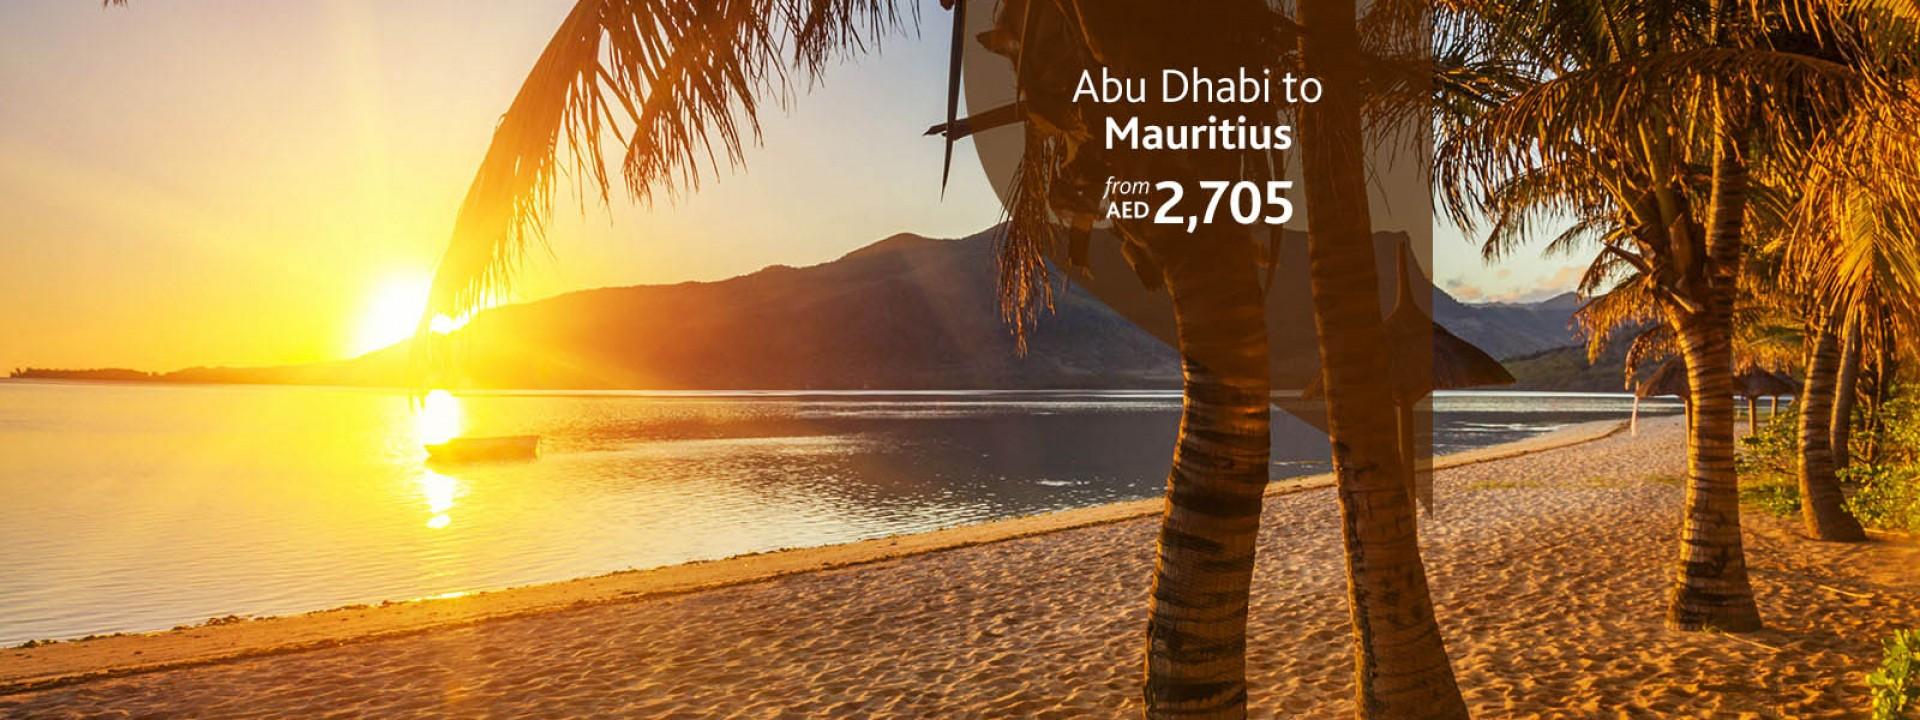 flights-from-abu-dhabi-to-mauritius-economy